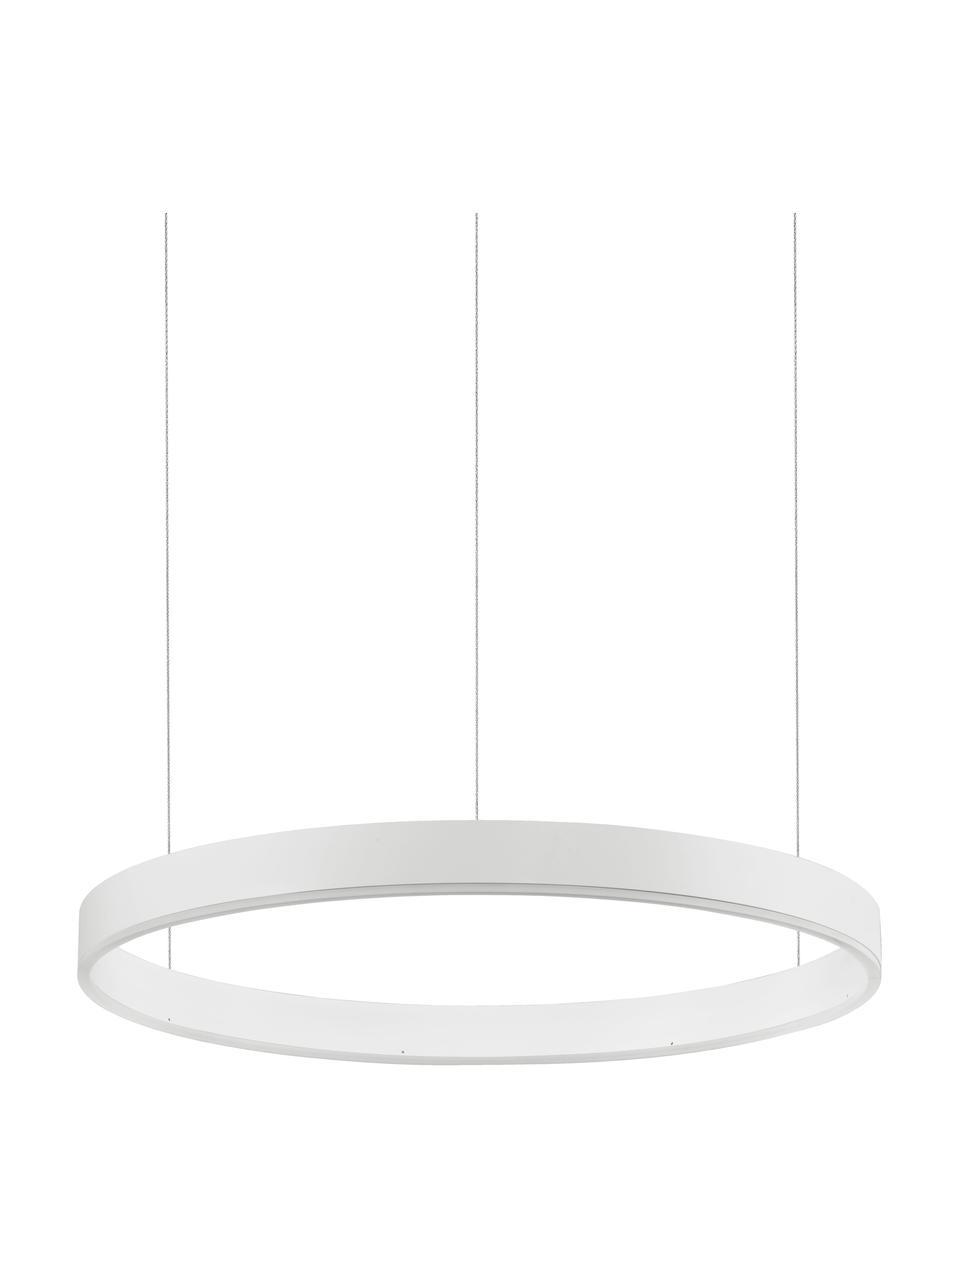 Lampada a sospensione a LED Motif, Paralume: alluminio rivestito, Baldacchino: alluminio rivestito, Bianco, Ø 60 x Alt. 190 cm